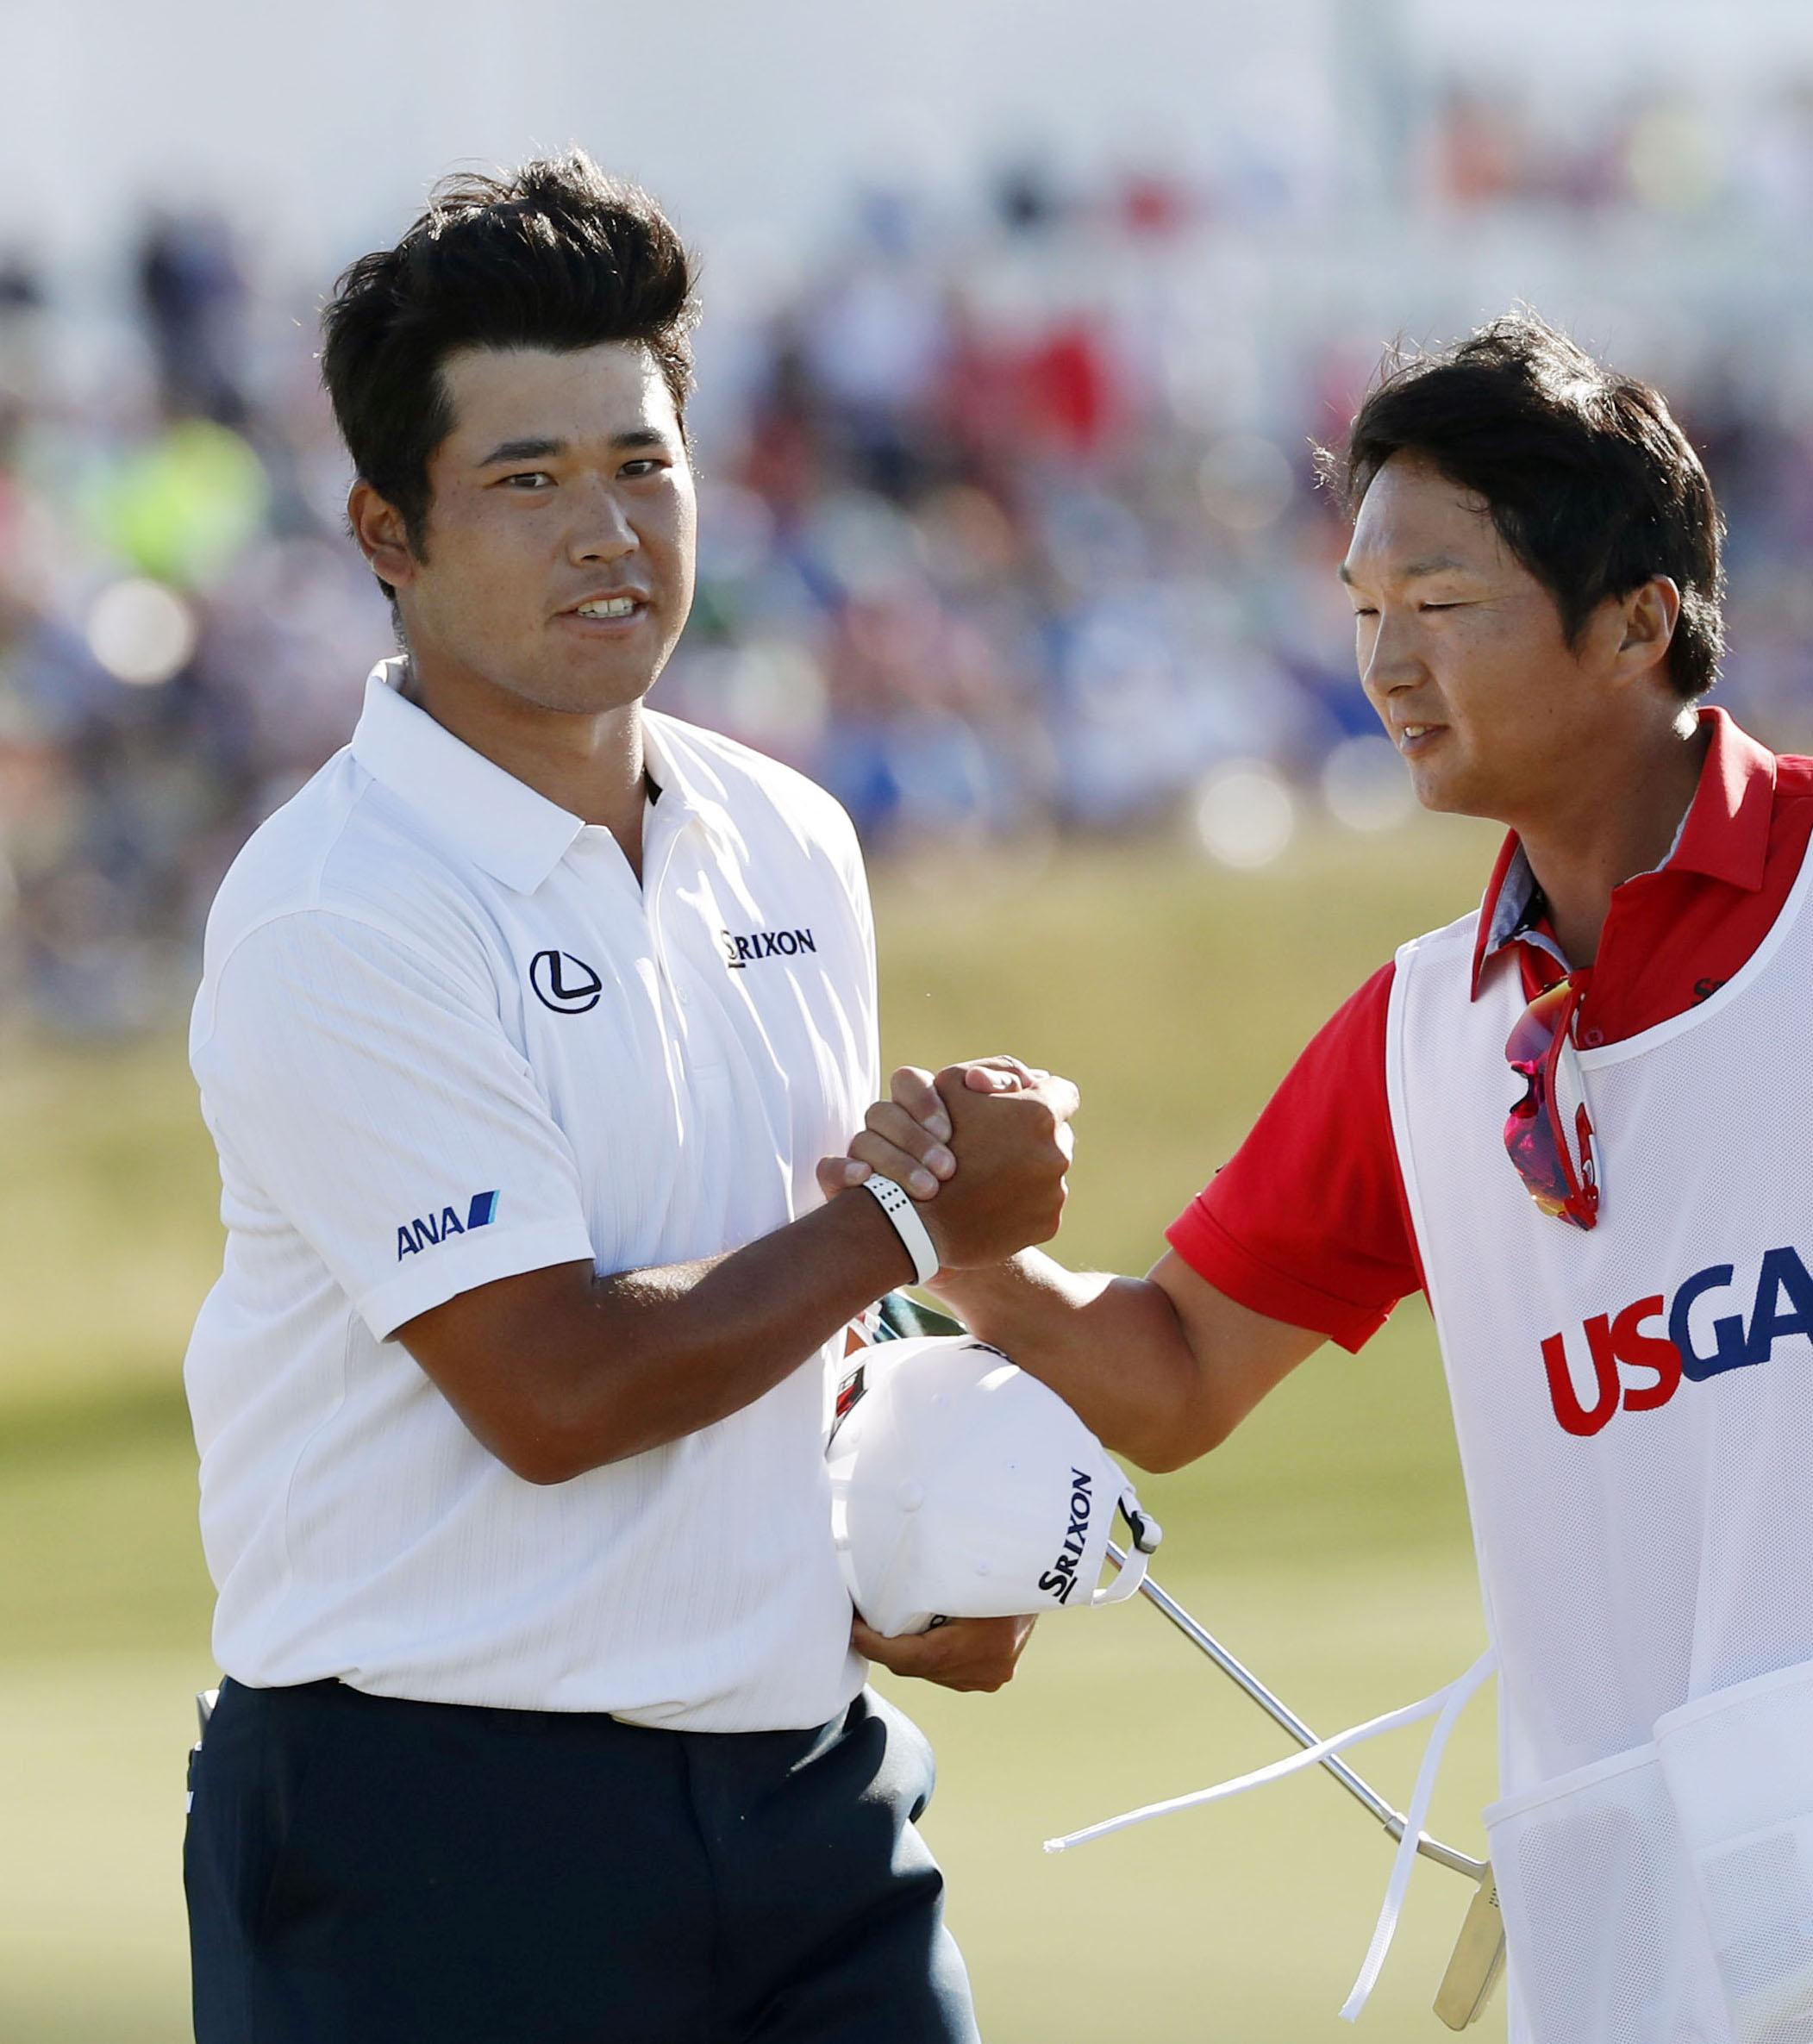 Golf: Japan's Matsuyama finishes 2nd at U.S. Open